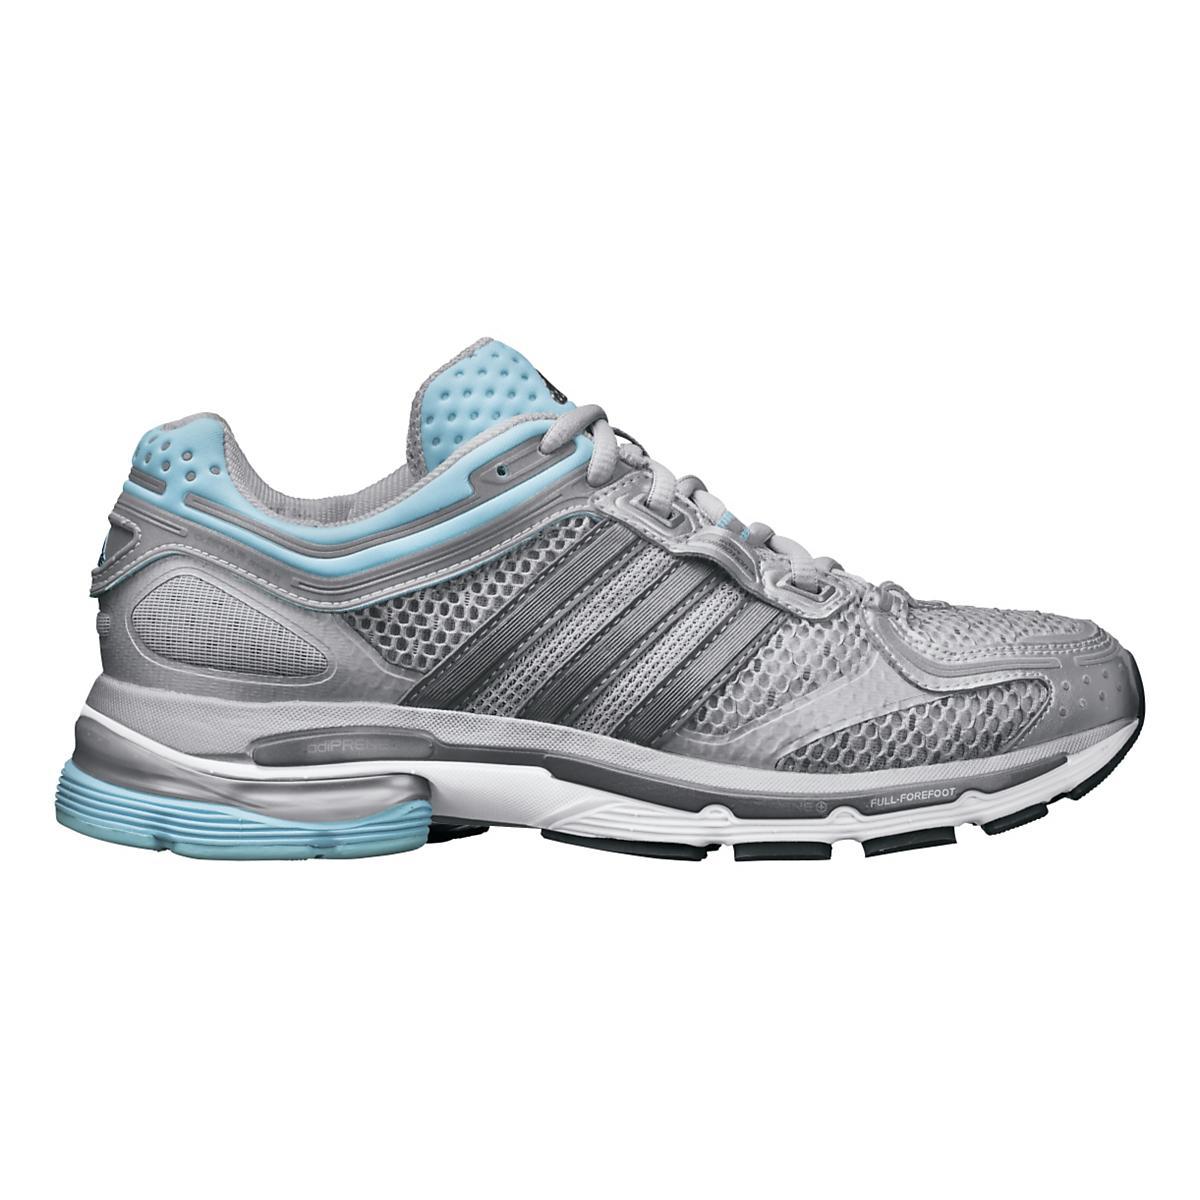 81cea38c6f9c Womens adidas adiSTAR Ride 3 Running Shoe at Road Runner Sports